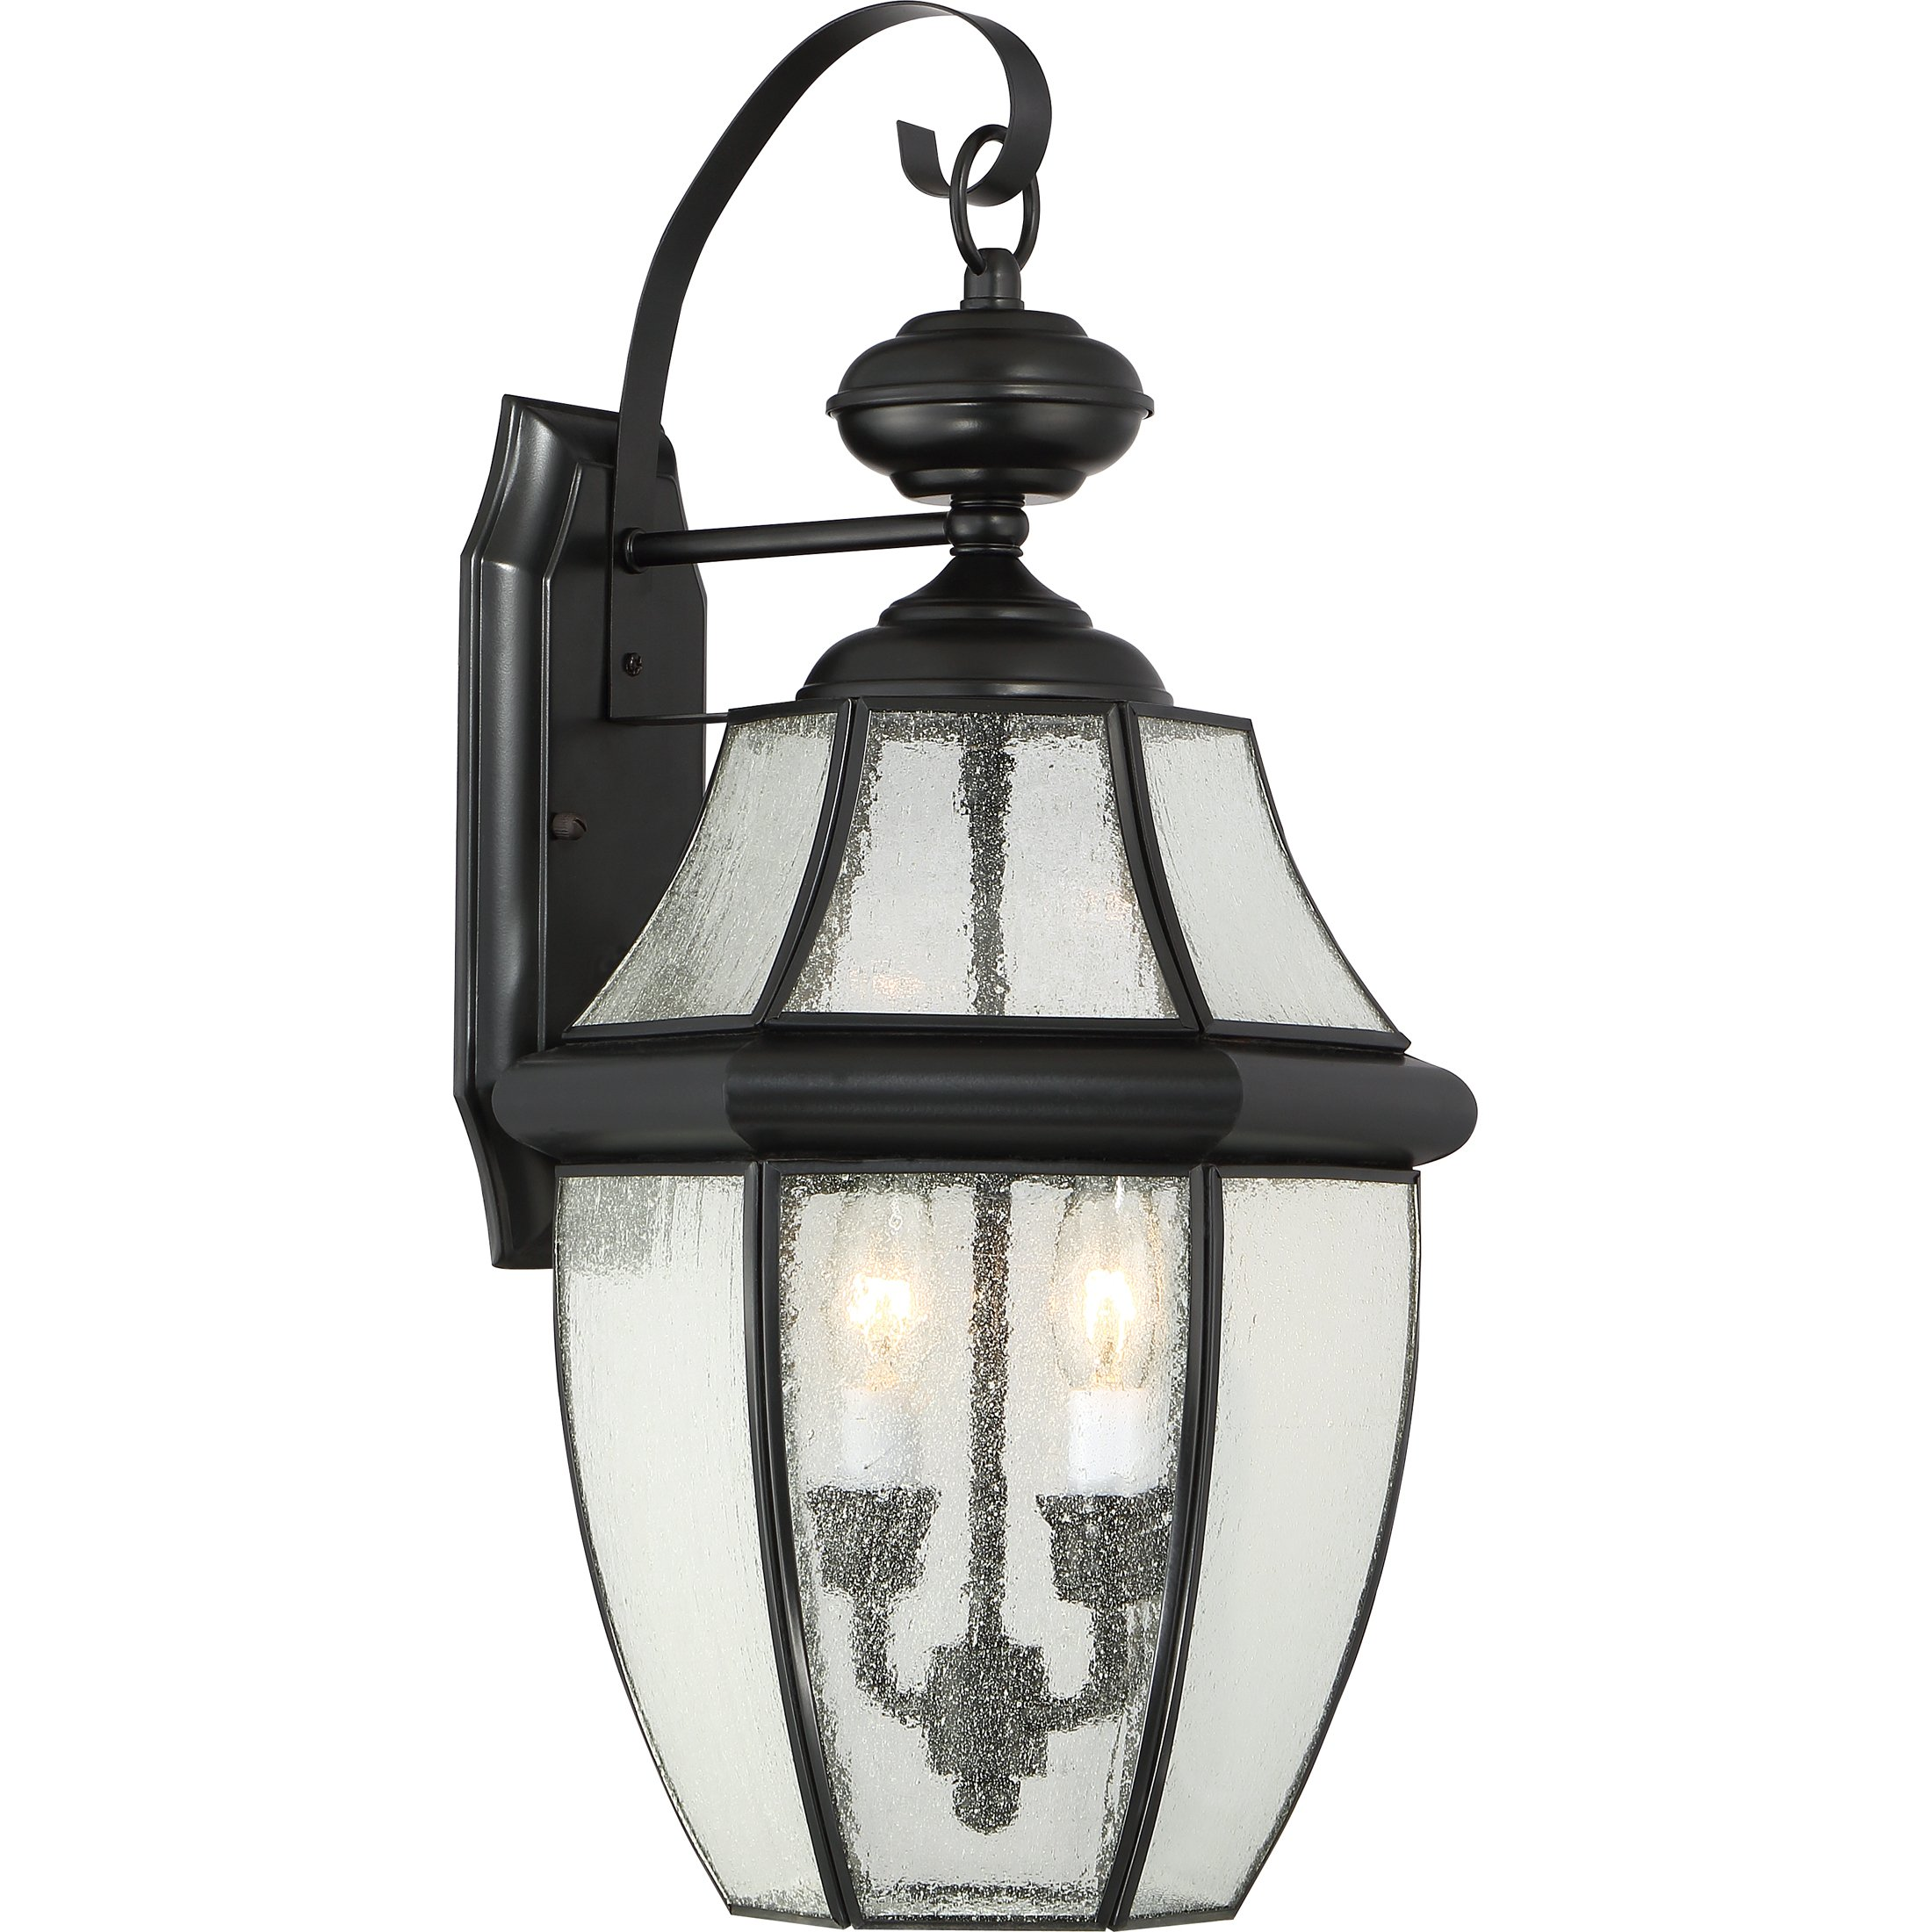 Quoizel NY8411K Newbury 2-Light Outdoor Lantern, Mystic Black by Quoizel